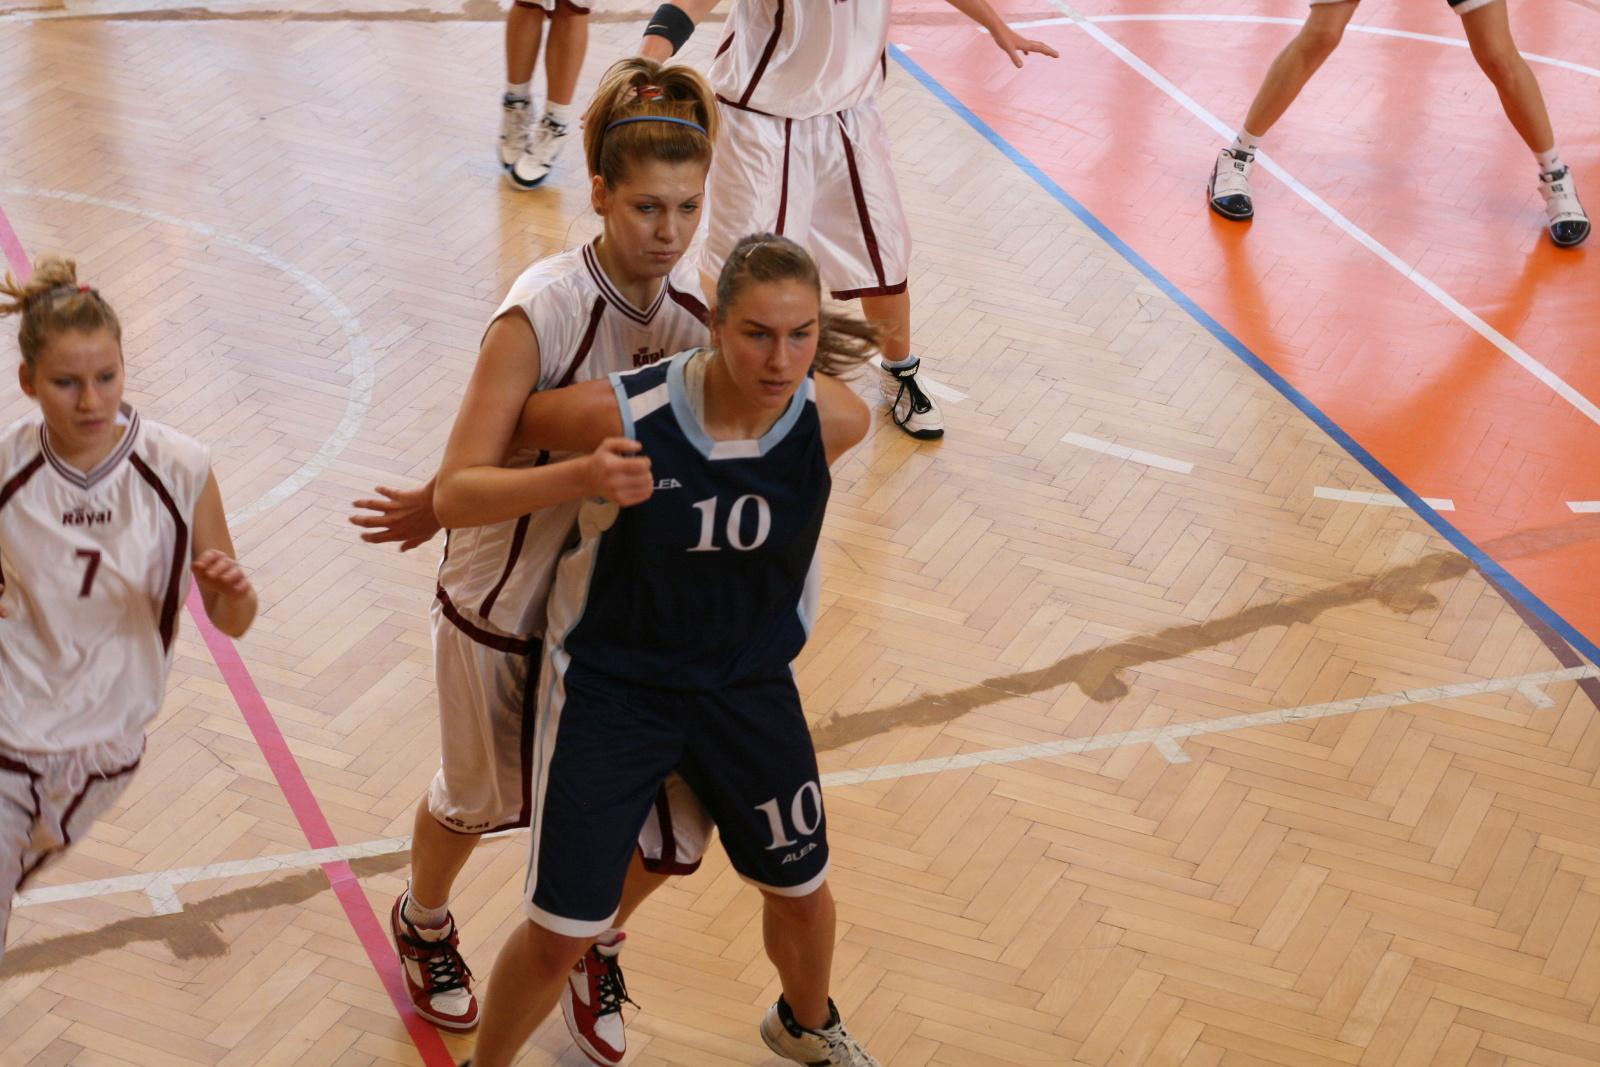 bk-zs-zvolen-bk-petrzalka-basketbal-juniorky-9